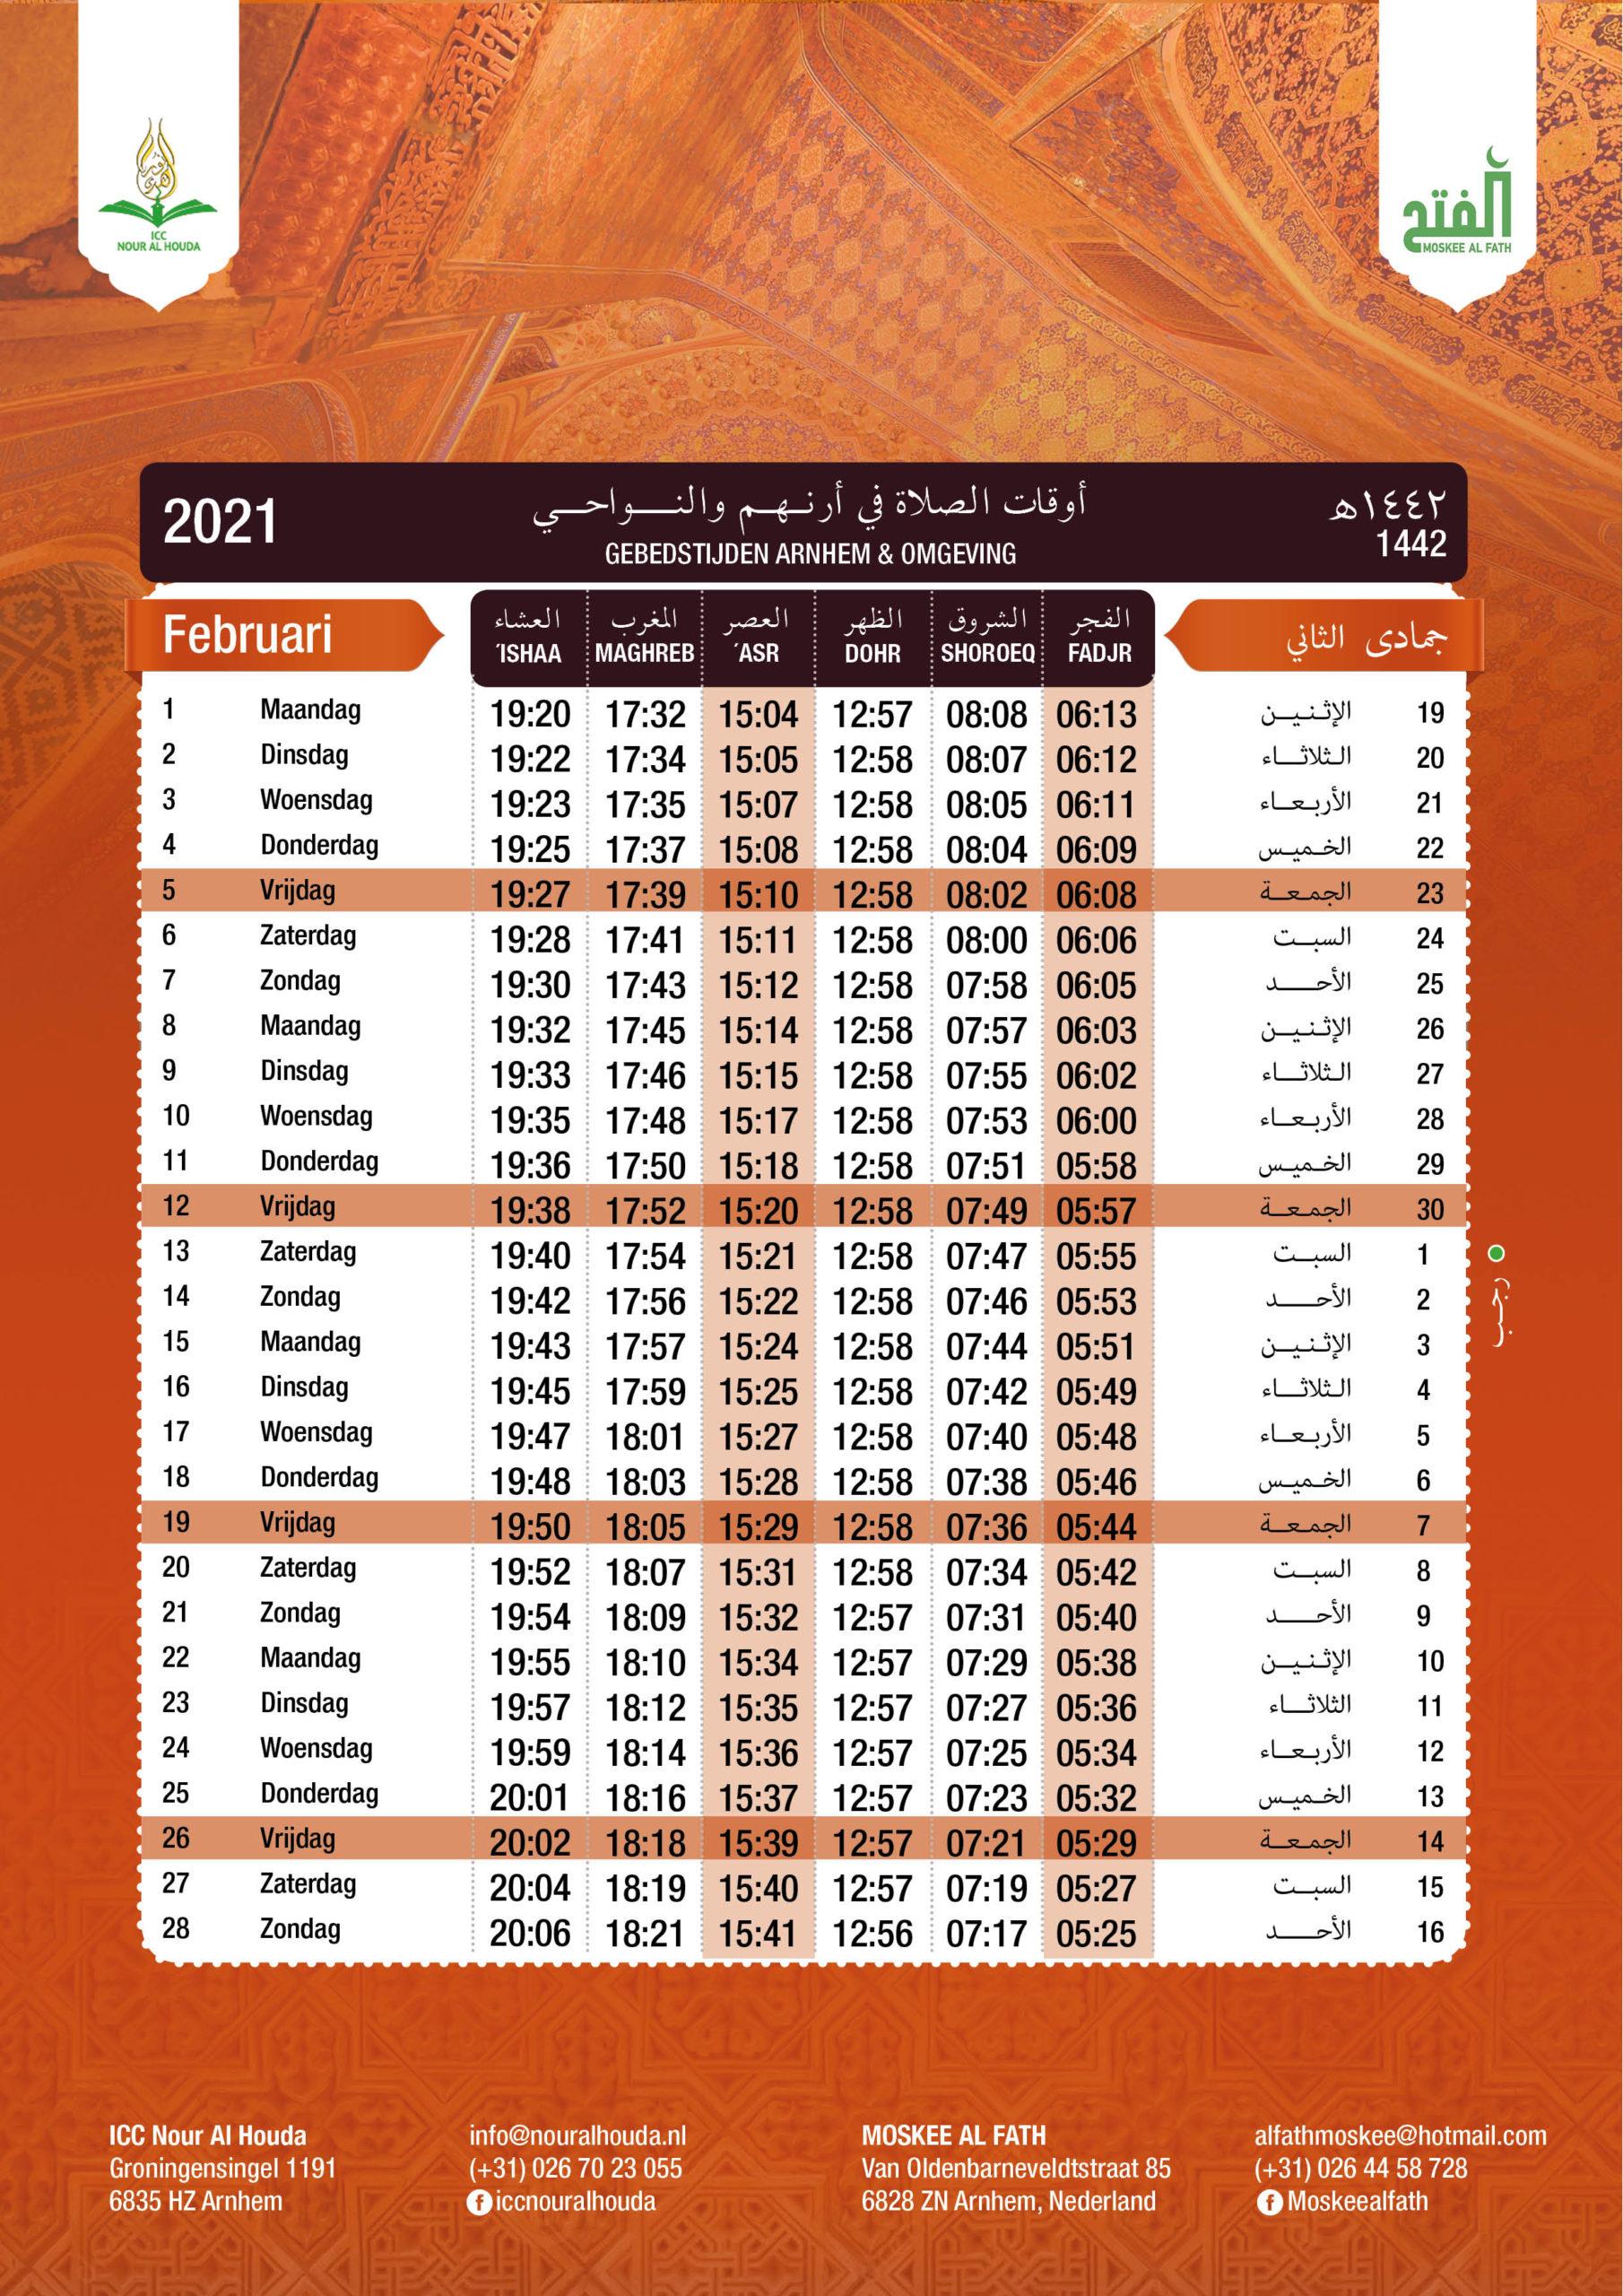 Gebedstijden Februari 2021 Arnhem Moskee Al Fath